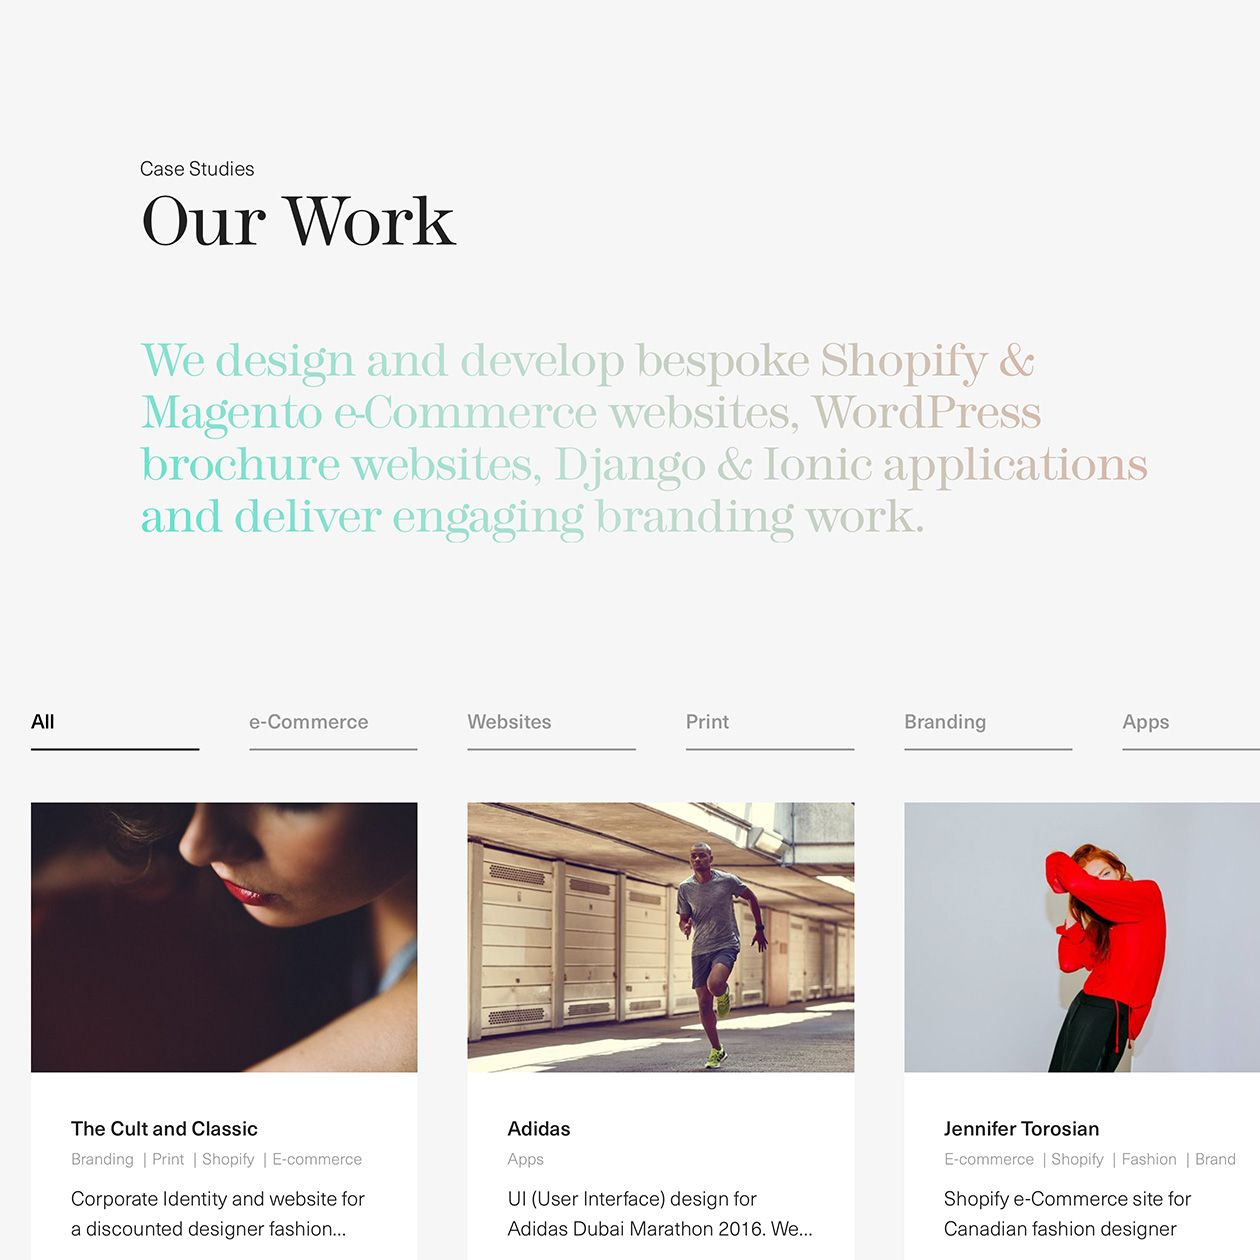 Fonts Used Modern 216 And Neue Haas Unica Typewolf Typography Inspiration Web Design Examples Portfolio Web Design Web Development Design